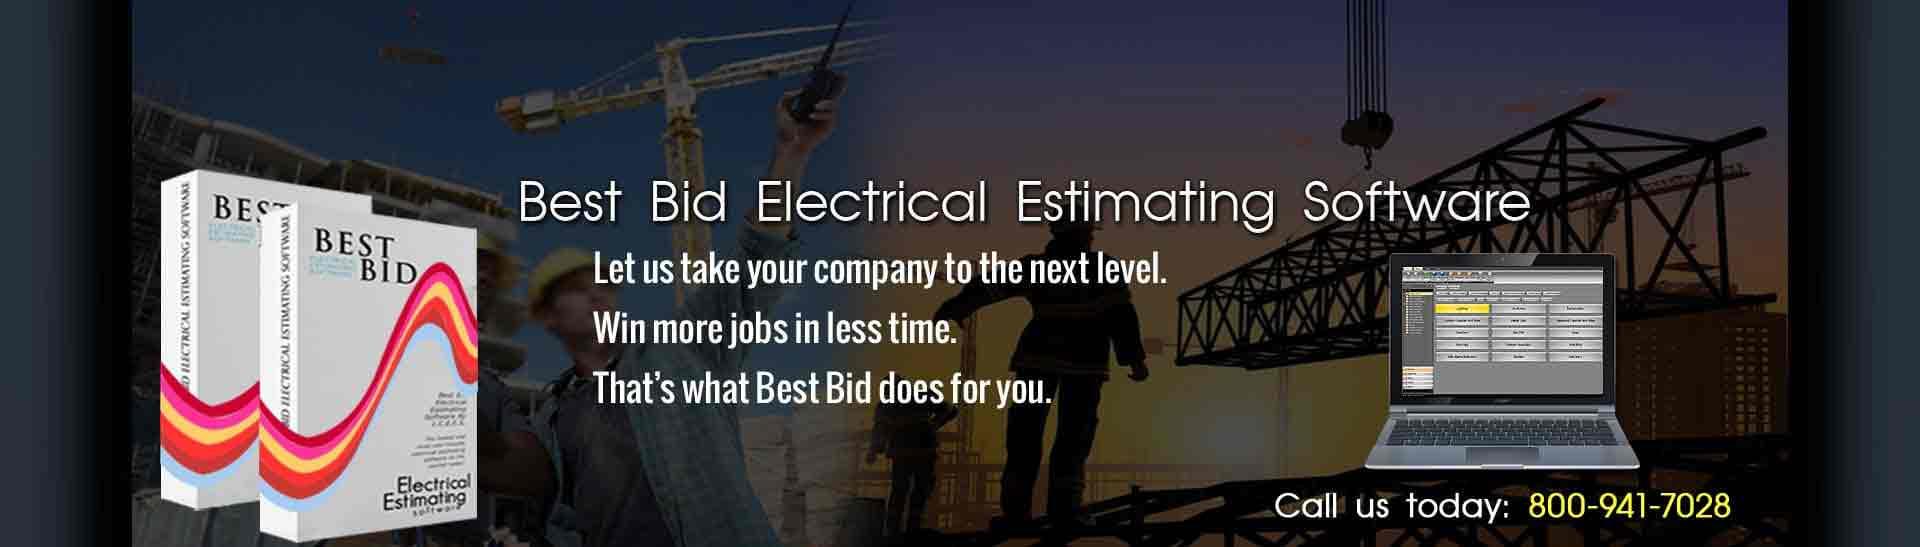 bestbid-electrical-estimating-software